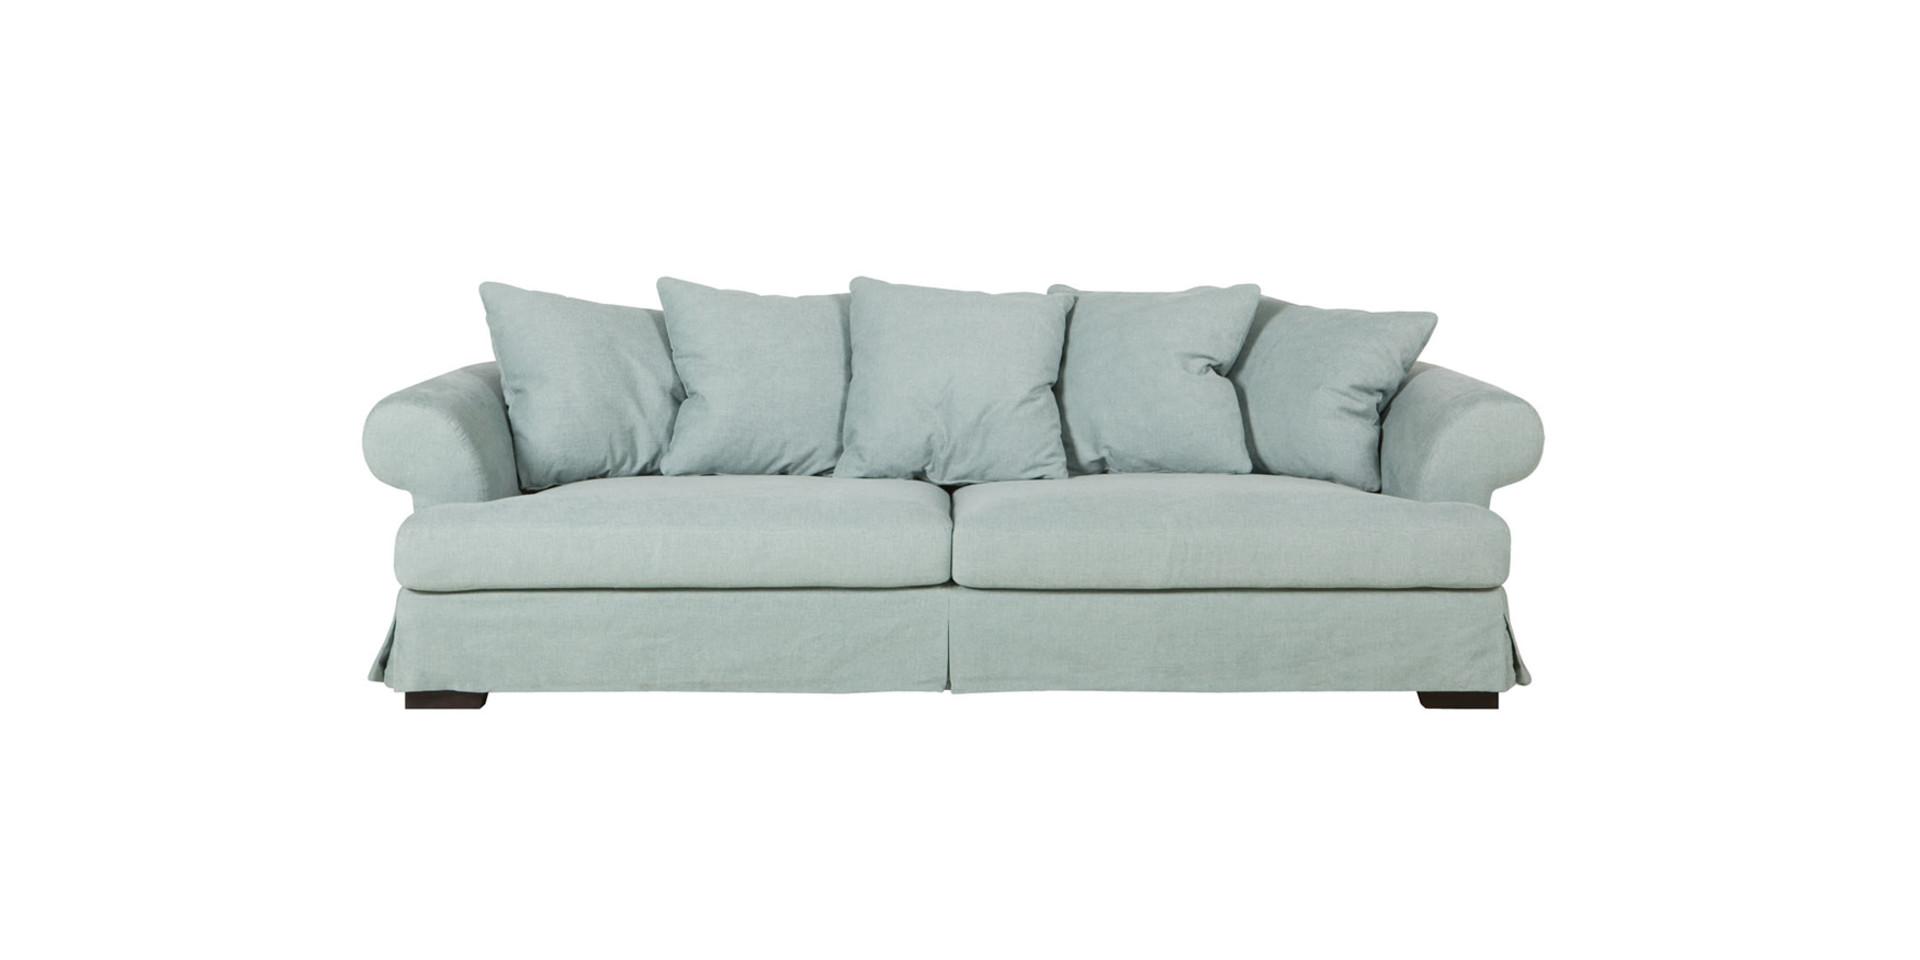 sits carlos canap s fauteuils angles poufs canape avenue. Black Bedroom Furniture Sets. Home Design Ideas